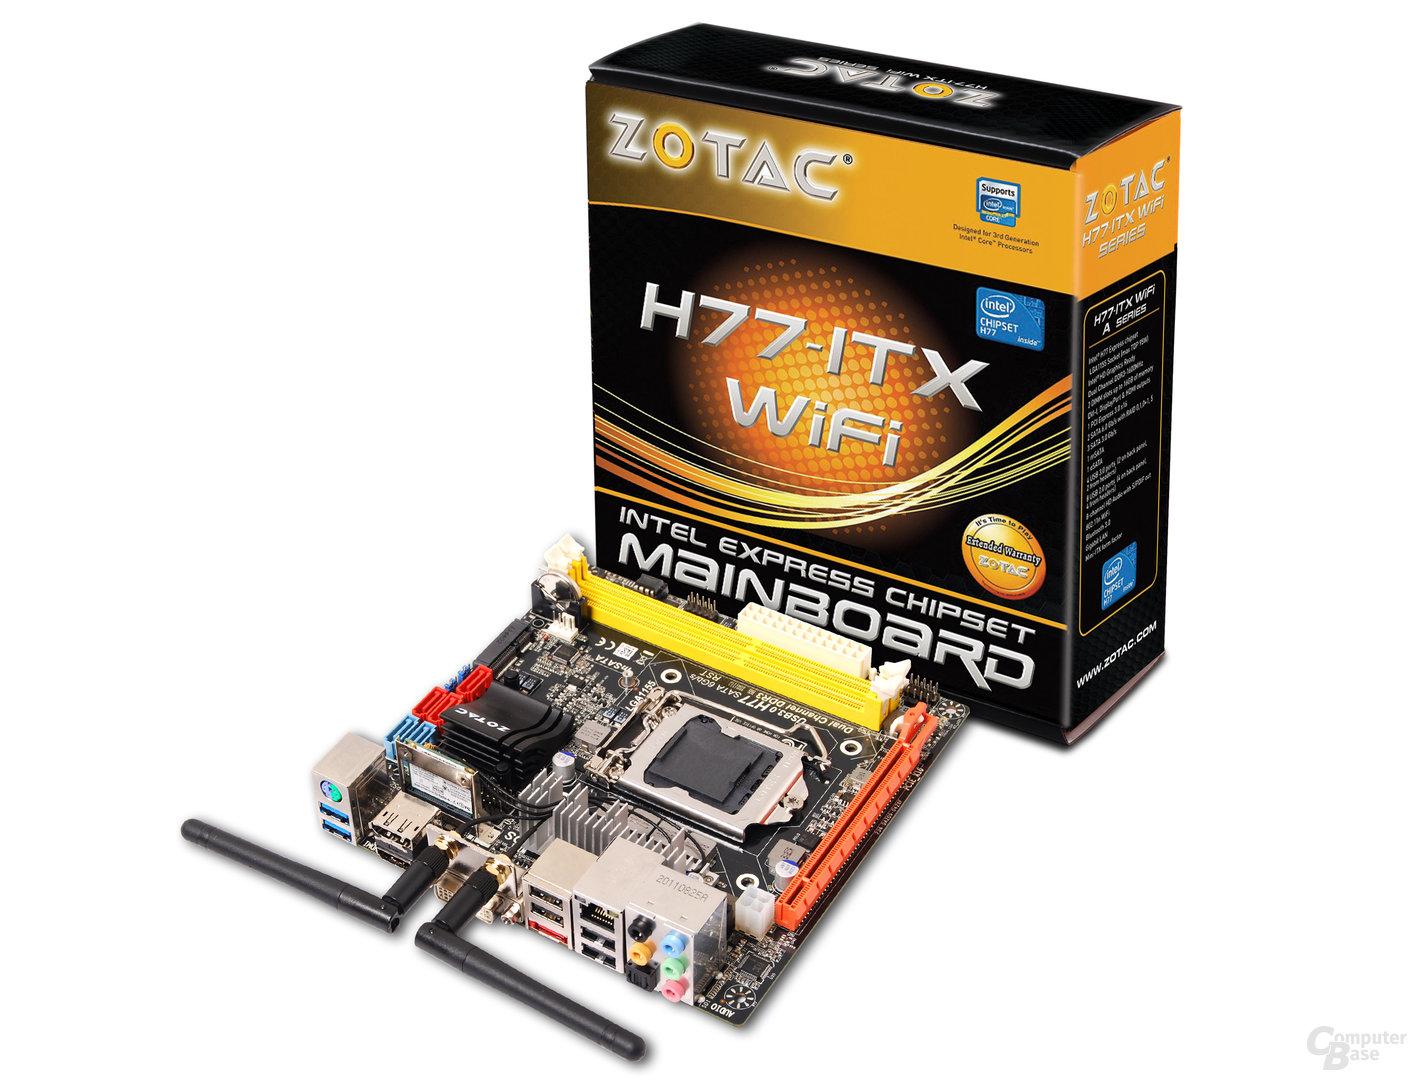 Zotac H77-ITX WIFI